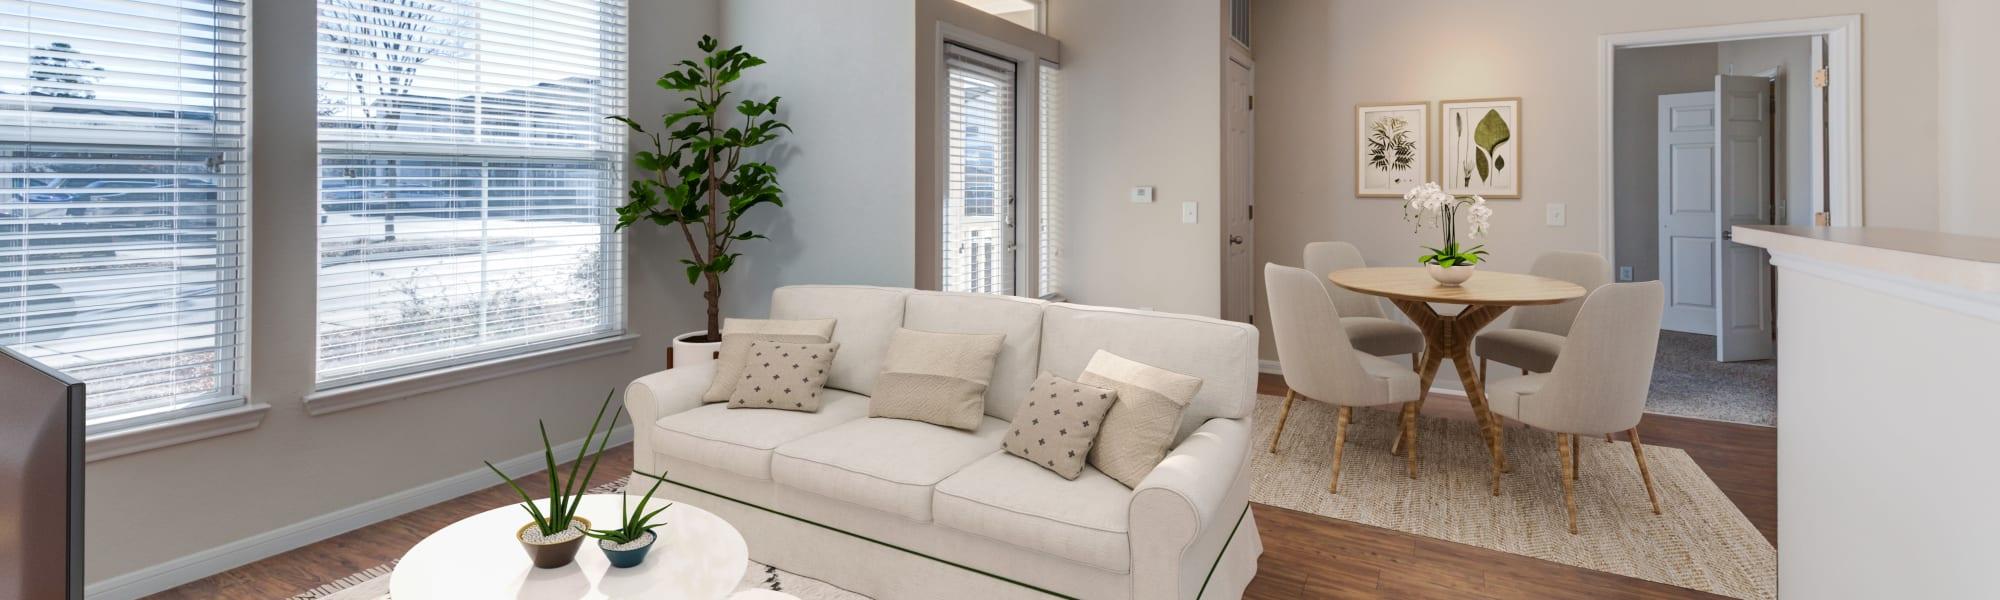 Floor plans at Ingleside Apartments in North Charleston, South Carolina